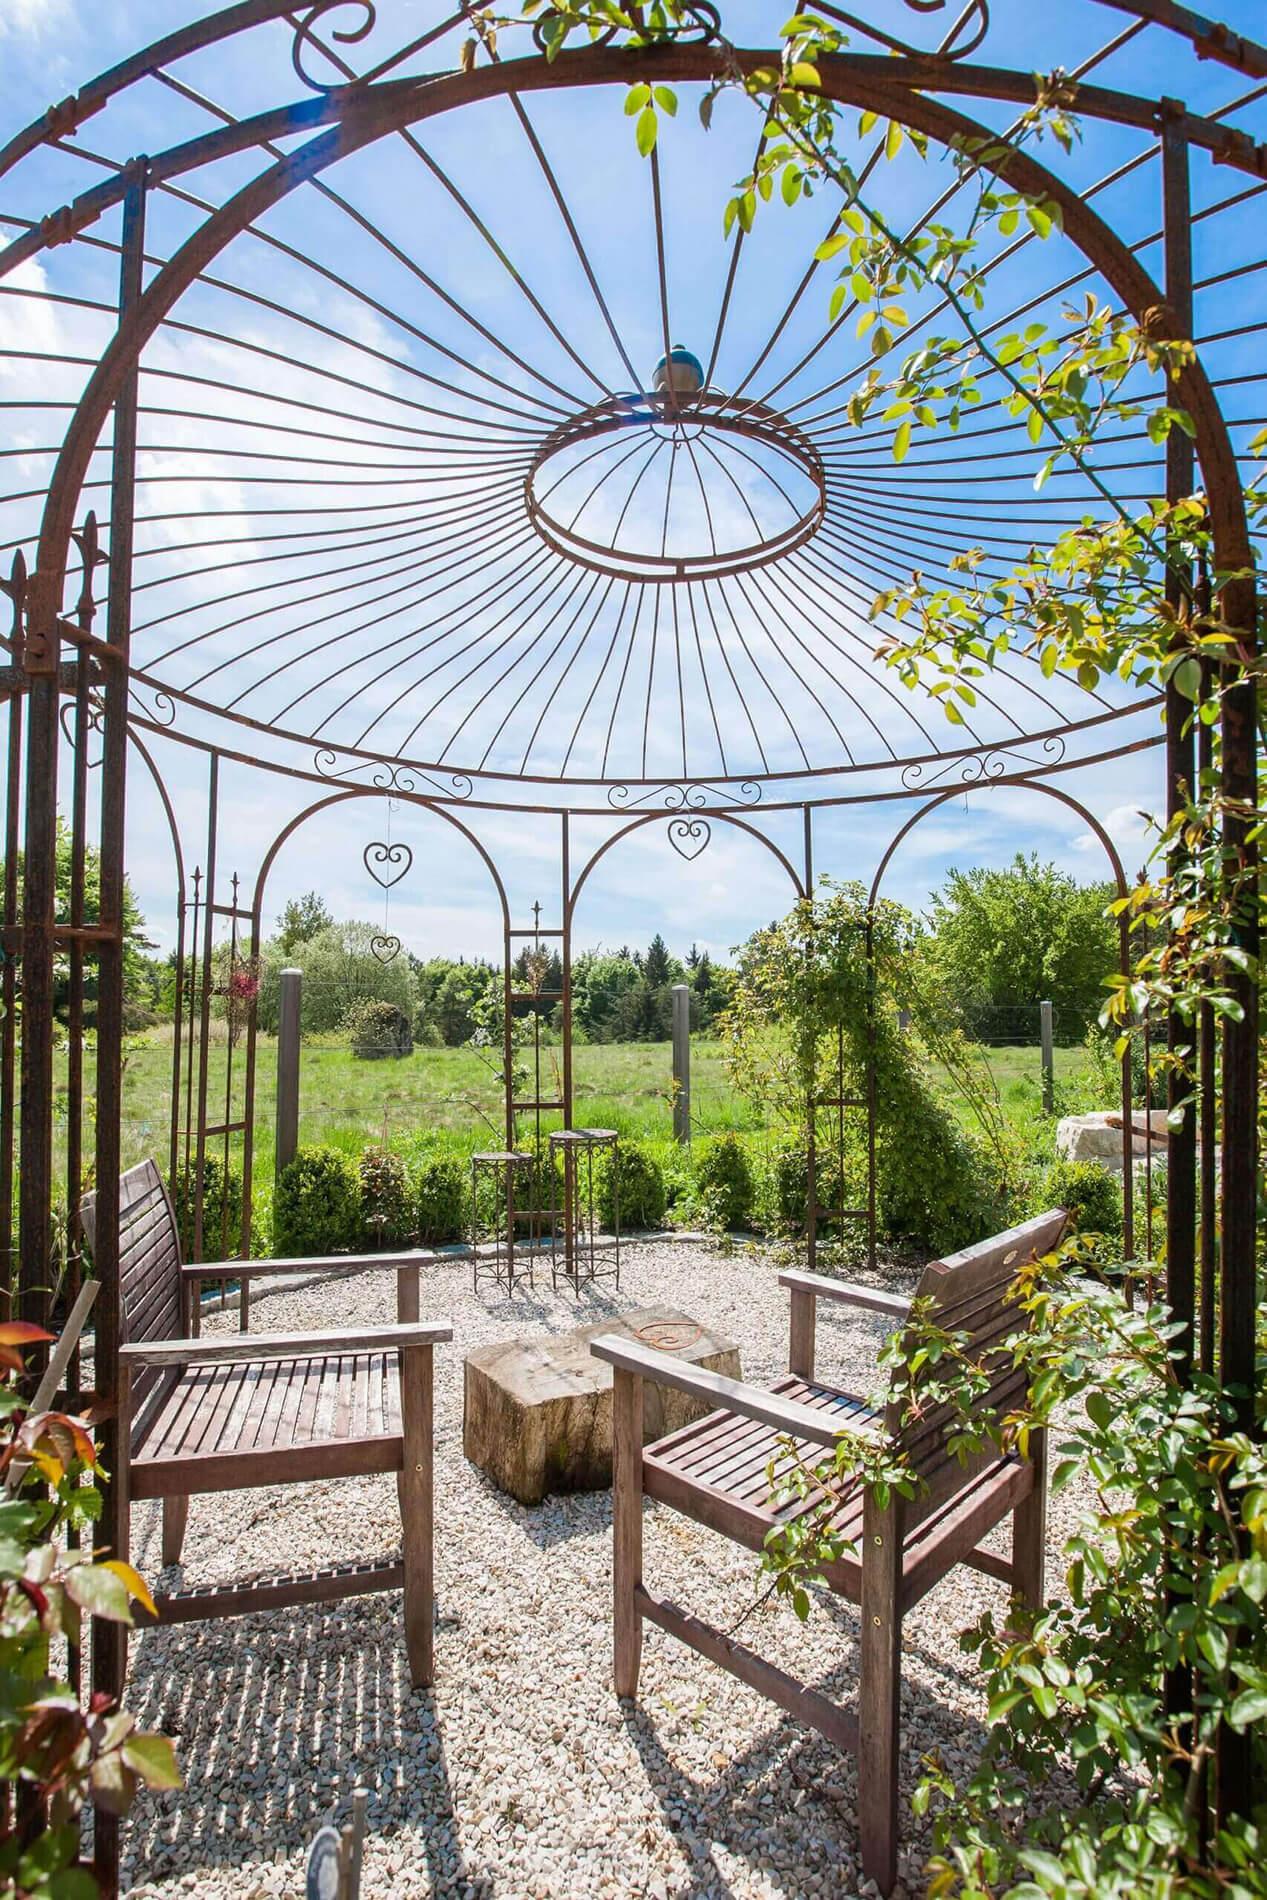 Pavillon Florenz - mit Edelrostpatina und Messingkugel